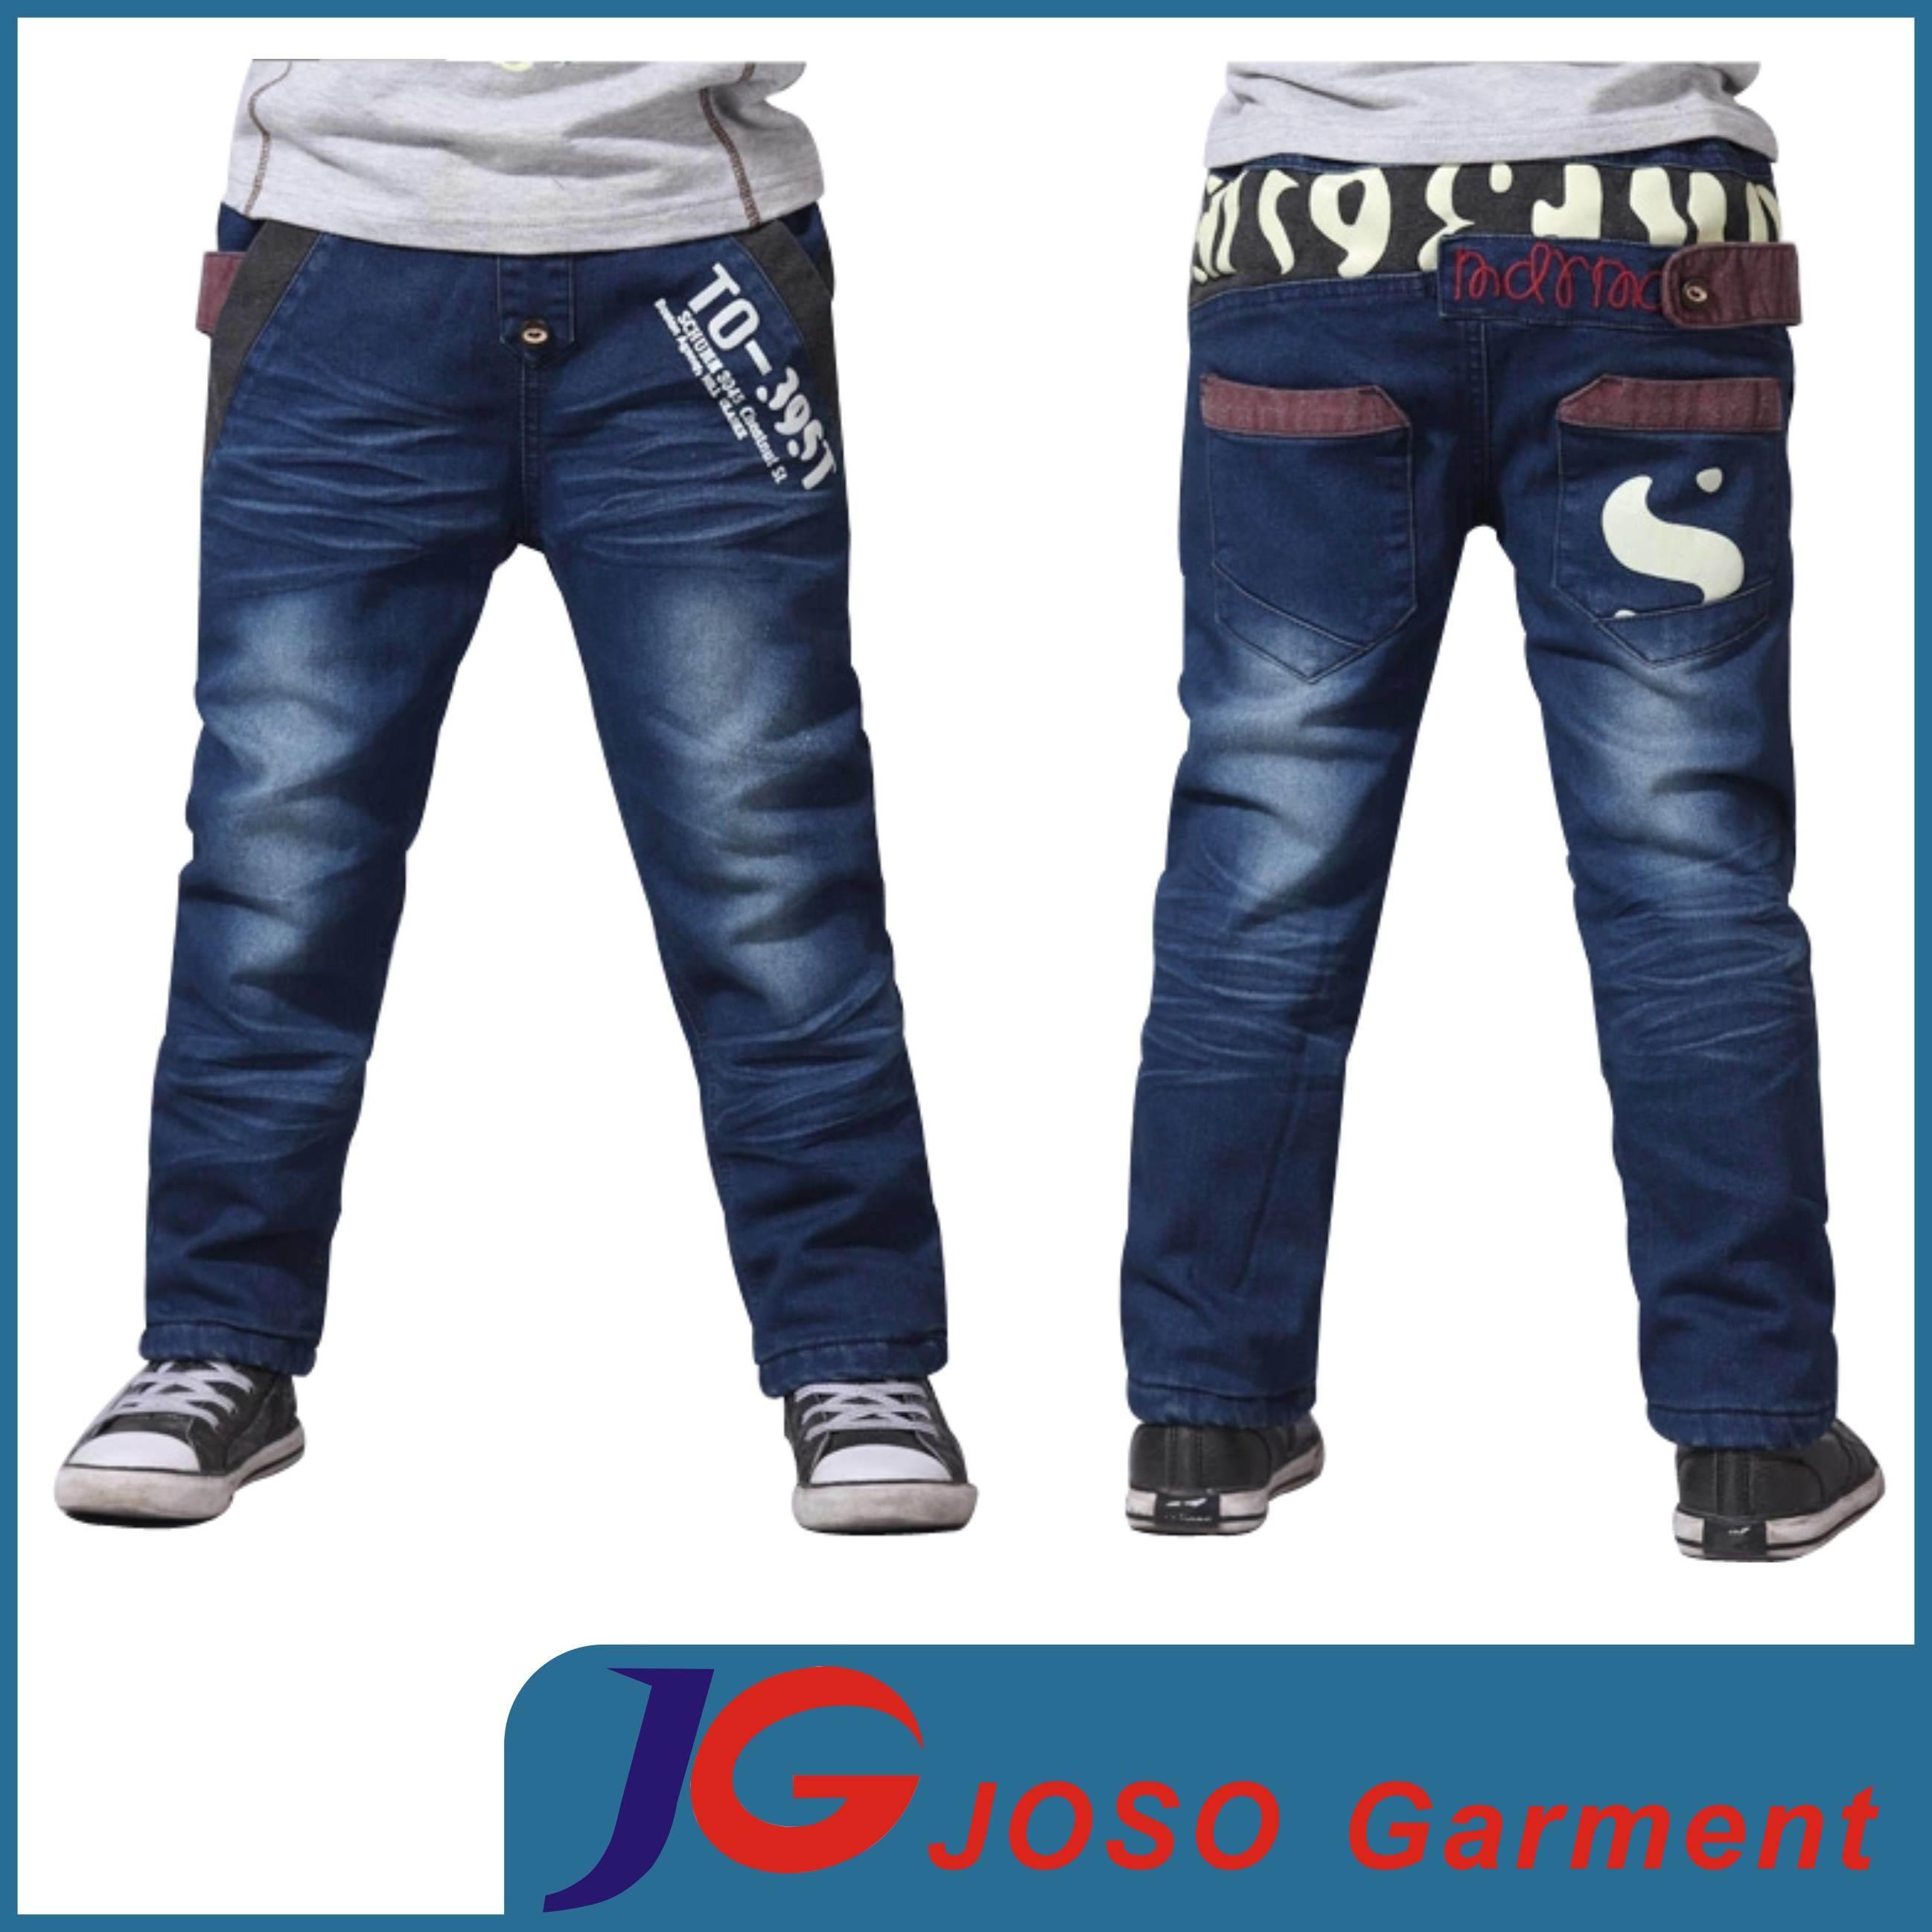 e50c25b4d0b4 China Kids Boys Designer Denim Jeans (JC8025) - China Boy Jeans, Boys  Designer Jeans